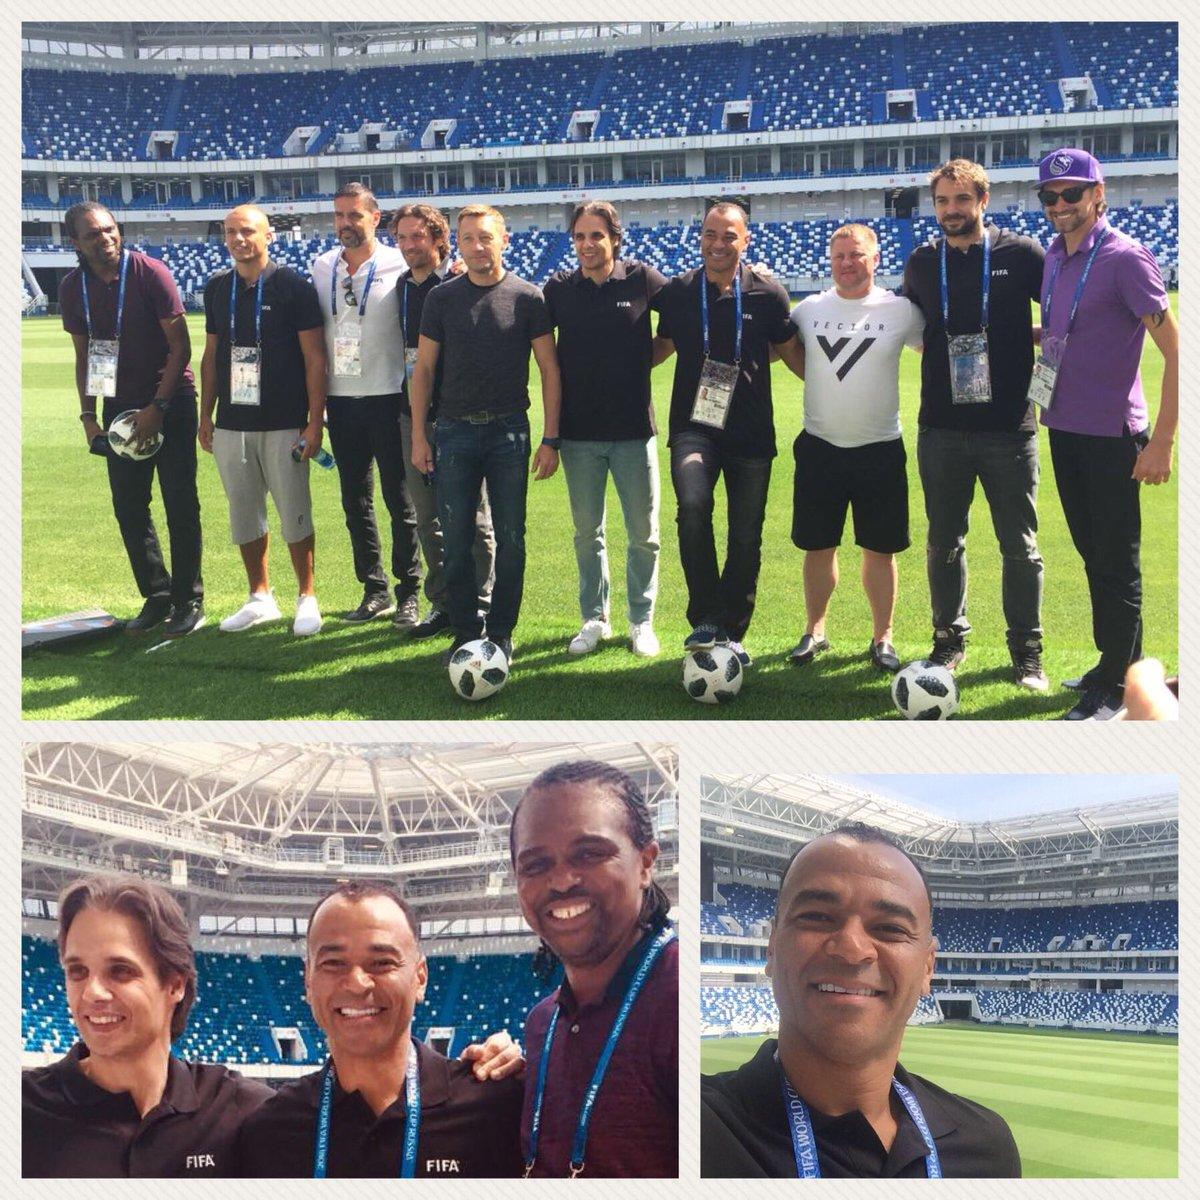 At Kaliningrad Stadium with friends and Legends!!! @FIFAWorldCup @Nuno_gomes21 @WesBrown24 @papilokanu Niko Kranjčar, Pascal, Panov, Sennikov, Tikhonov, Nigmatullin